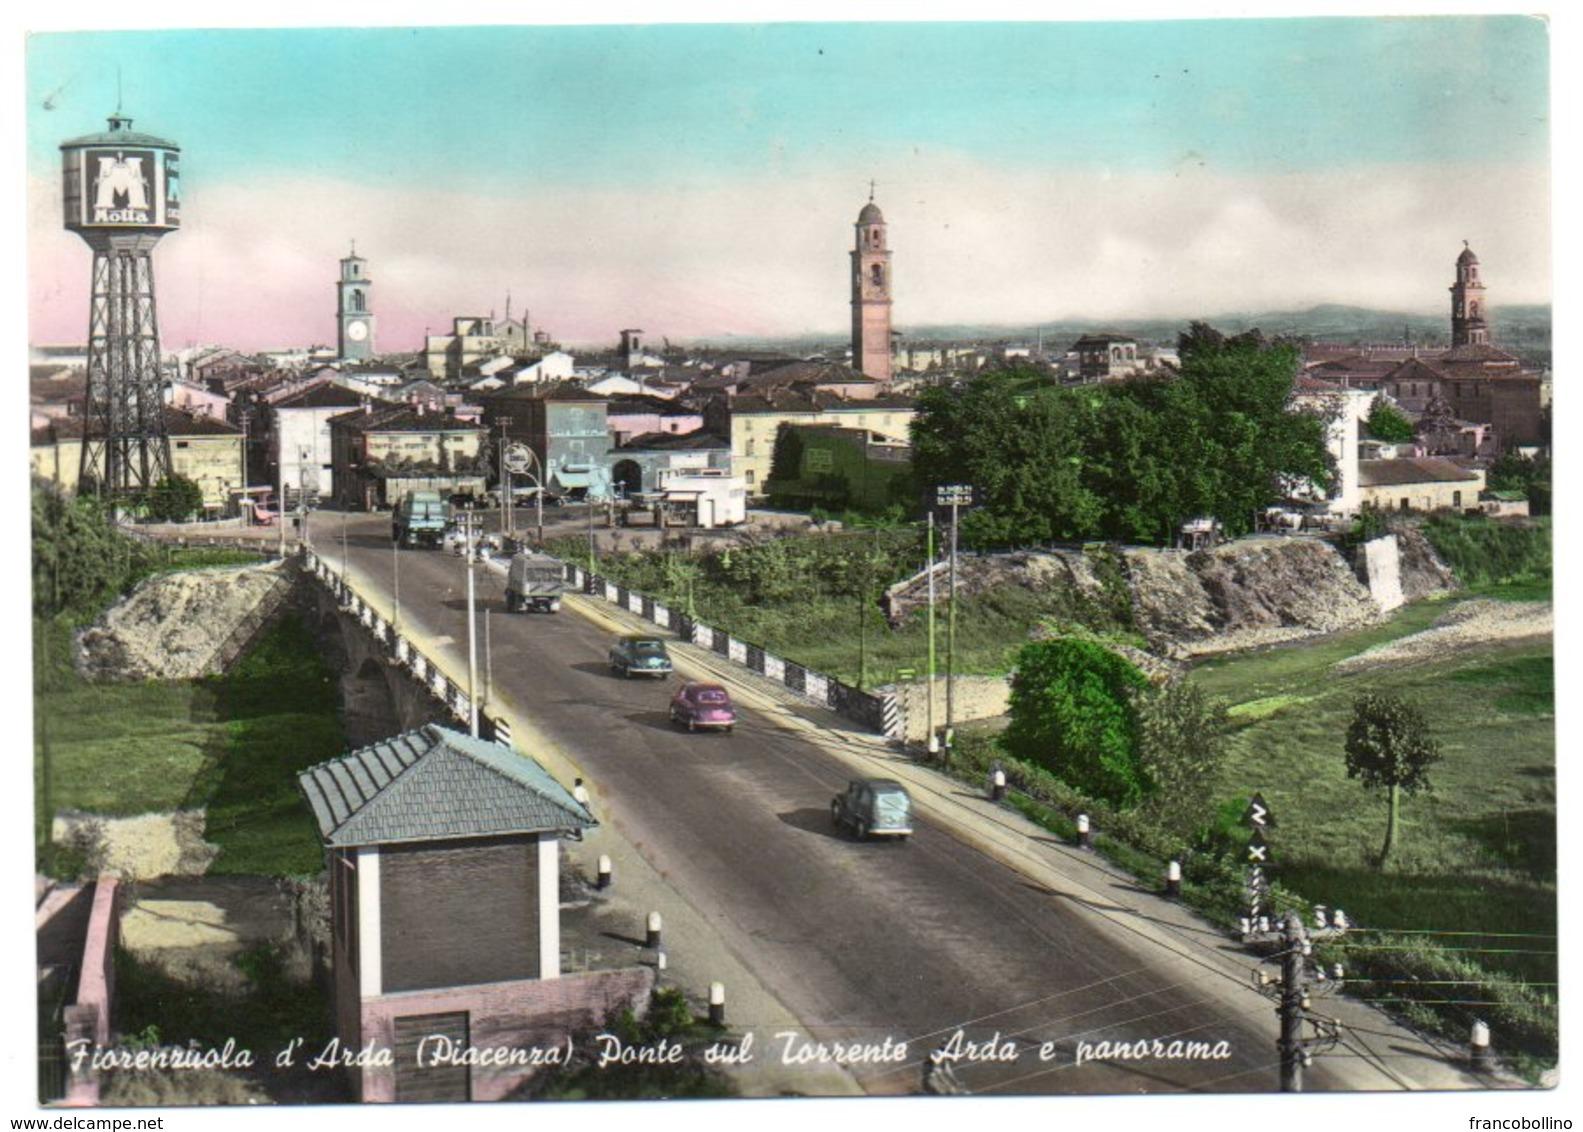 FIORENZUOLA D'ARDA (PIACENZA) - PONTE SUL TORRENTE ARDA E PANORAMA - Piacenza